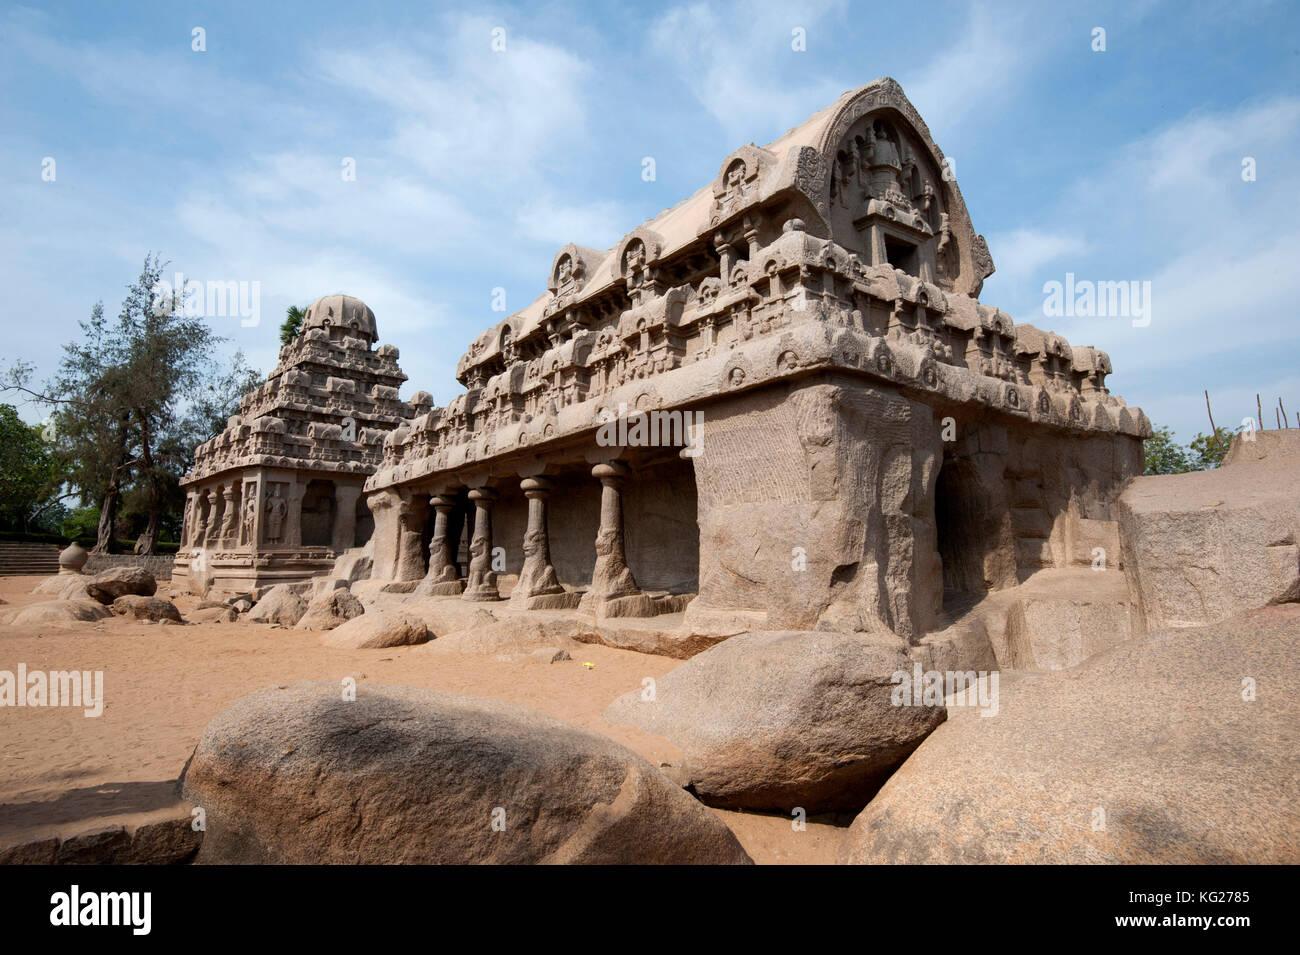 Teil des Pancha rathas Monument, das komplexe, aus dem 7. Jahrhundert, mahaballipuram, Weltkulturerbe der UNESCO, Stockbild